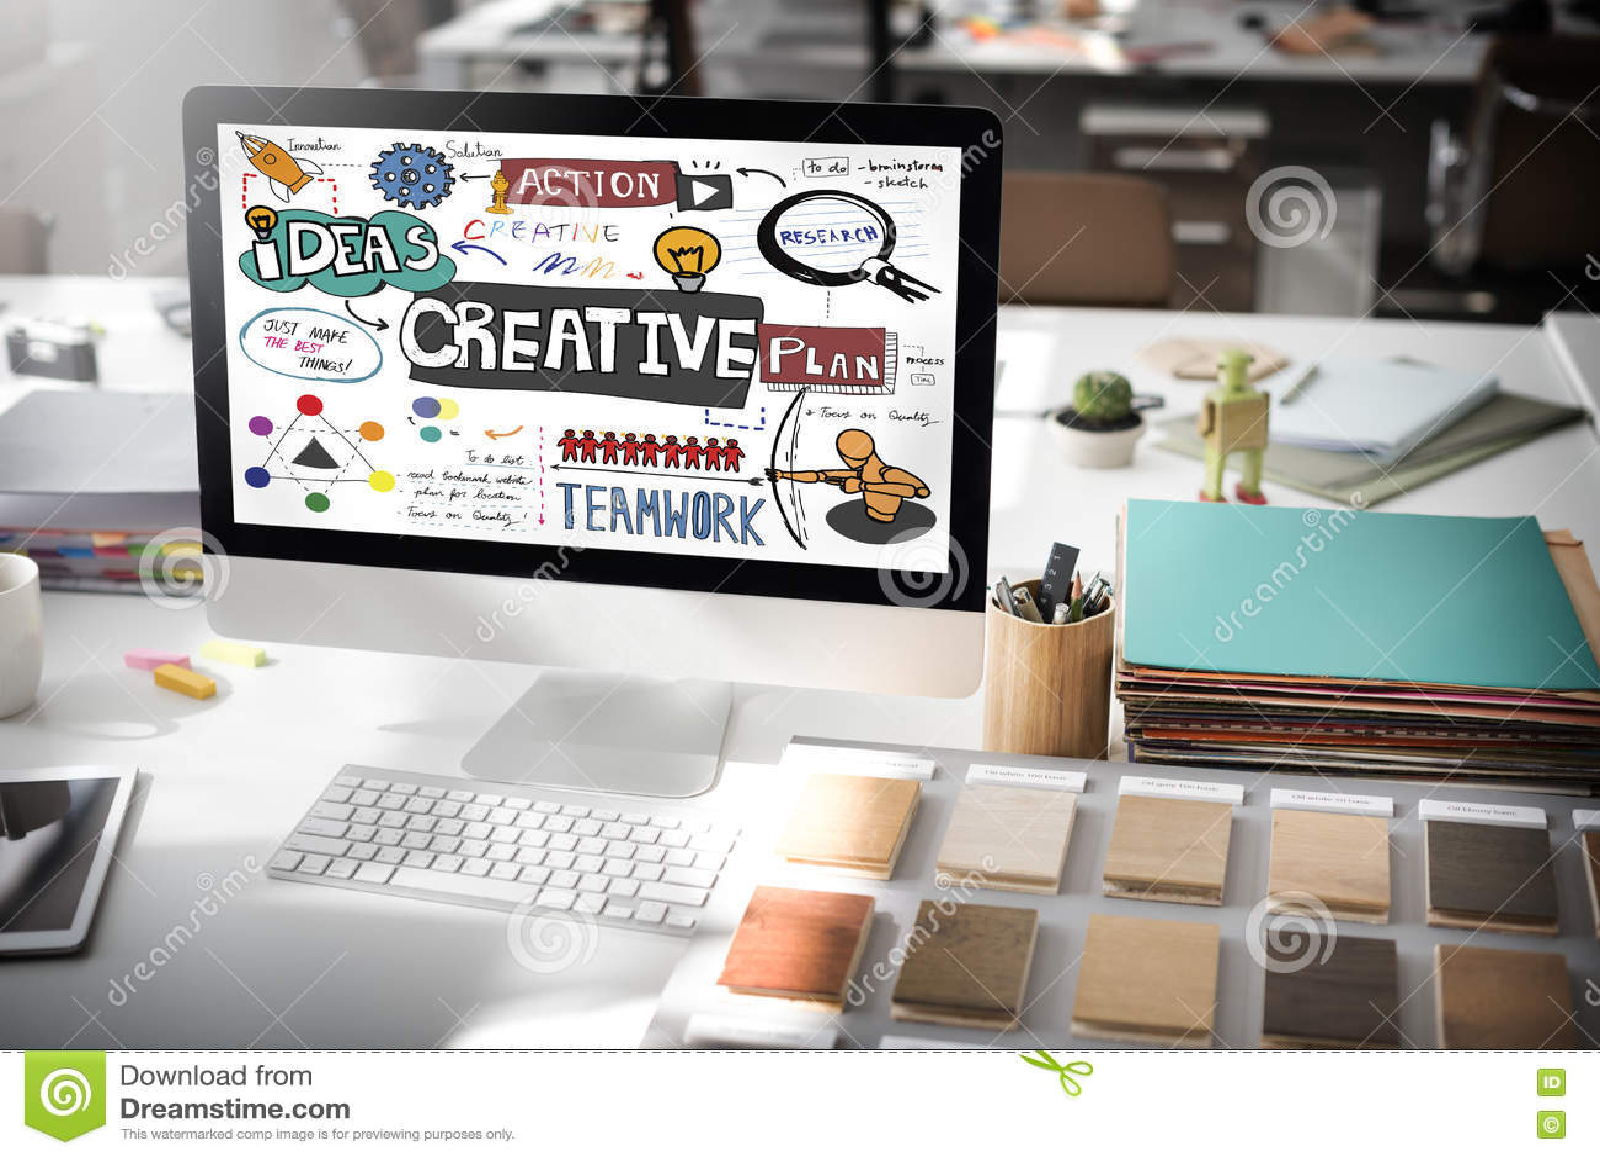 creative design innovation inspire concept stock illustration creative design innovation inspire concept